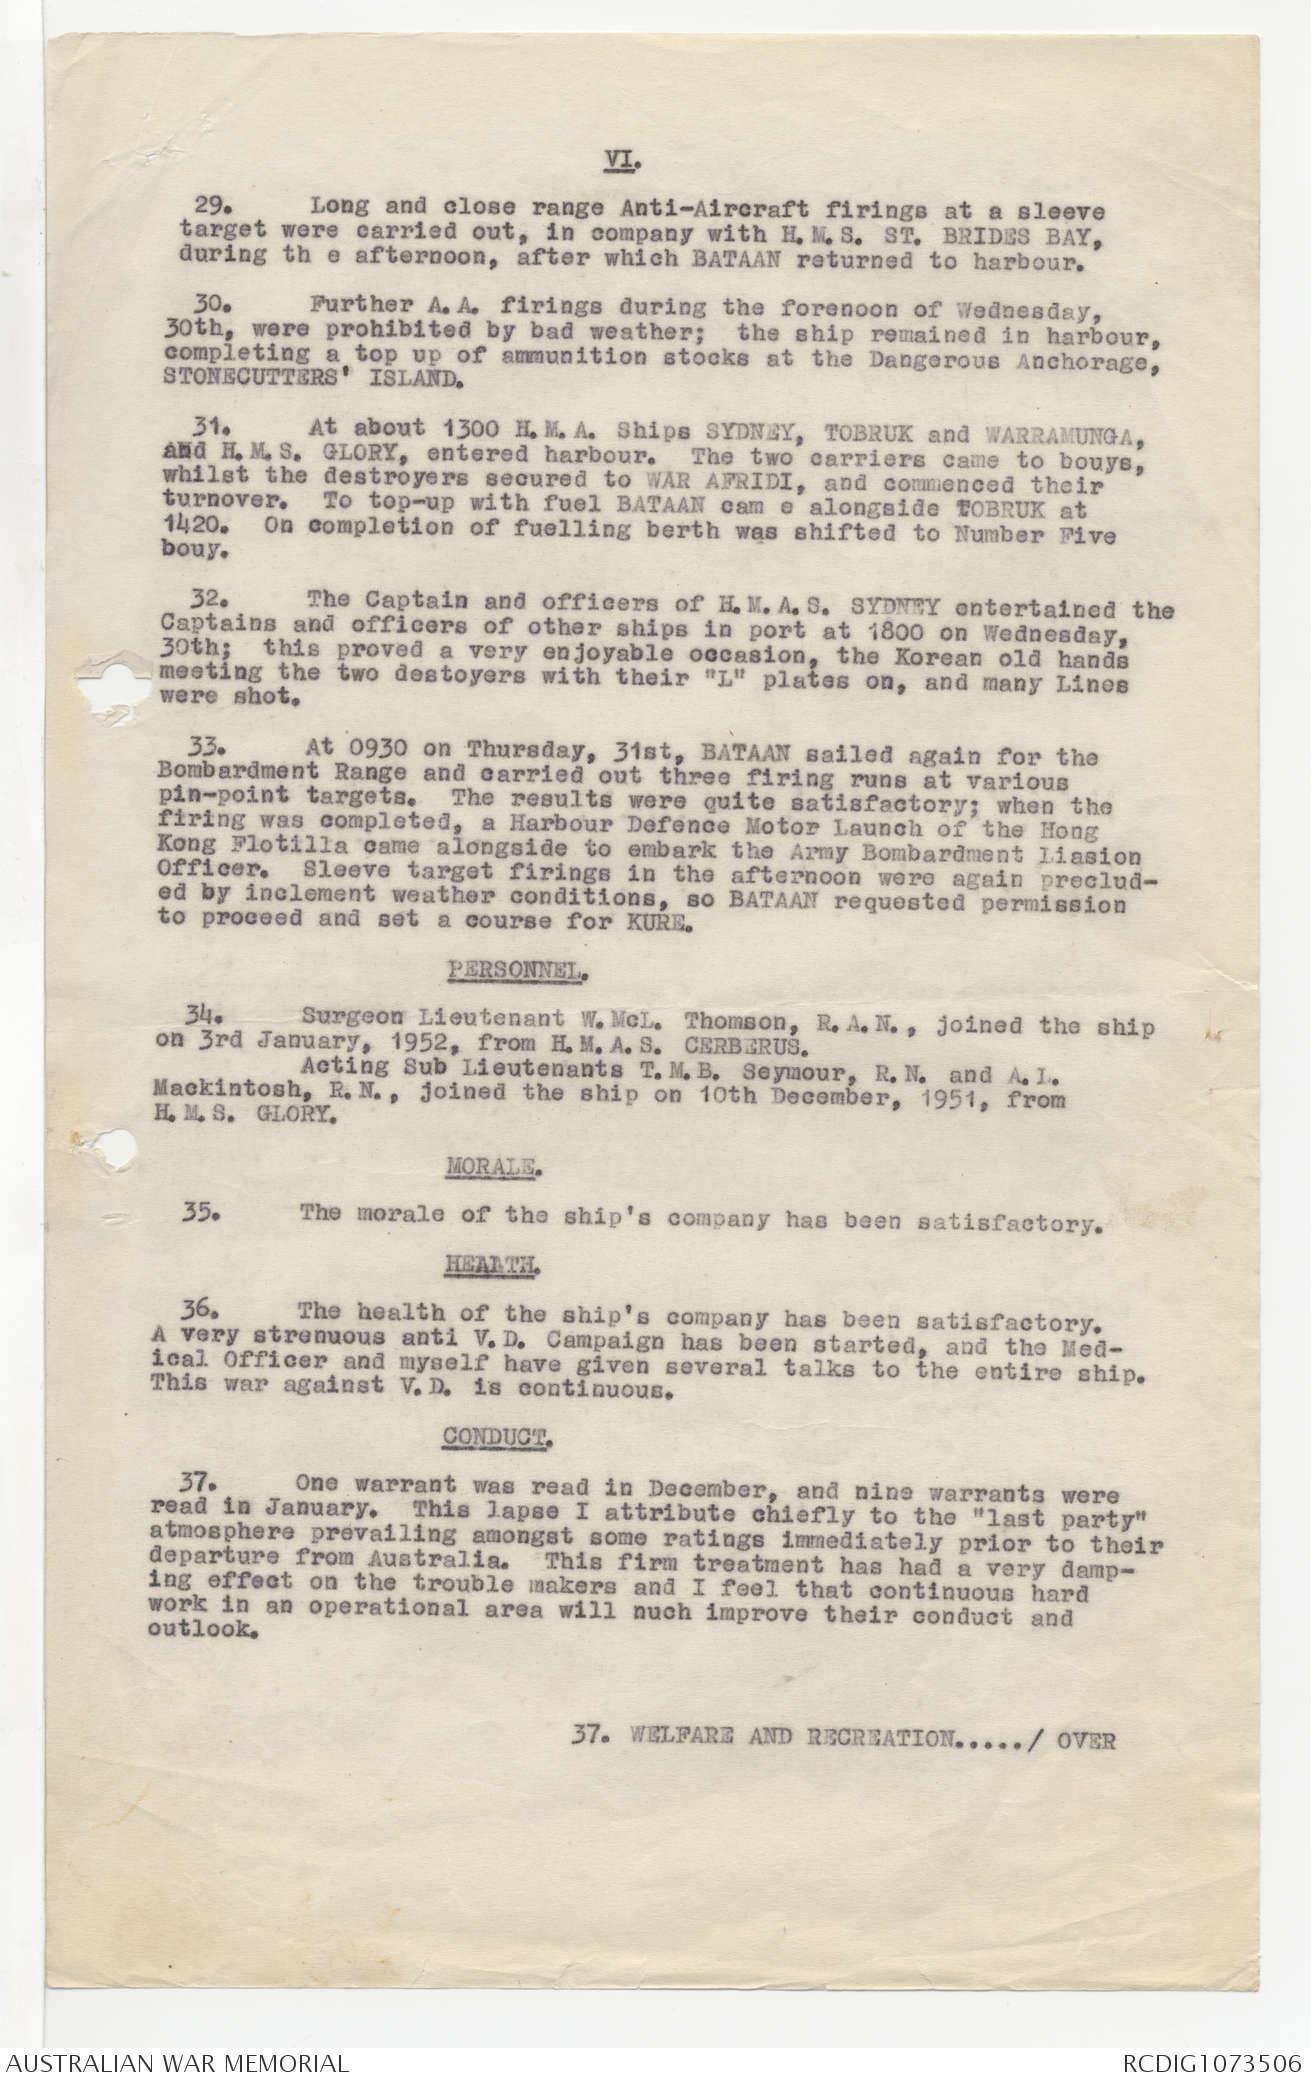 AWM78 58/3 - January 1950 - January 1952  | The Australian